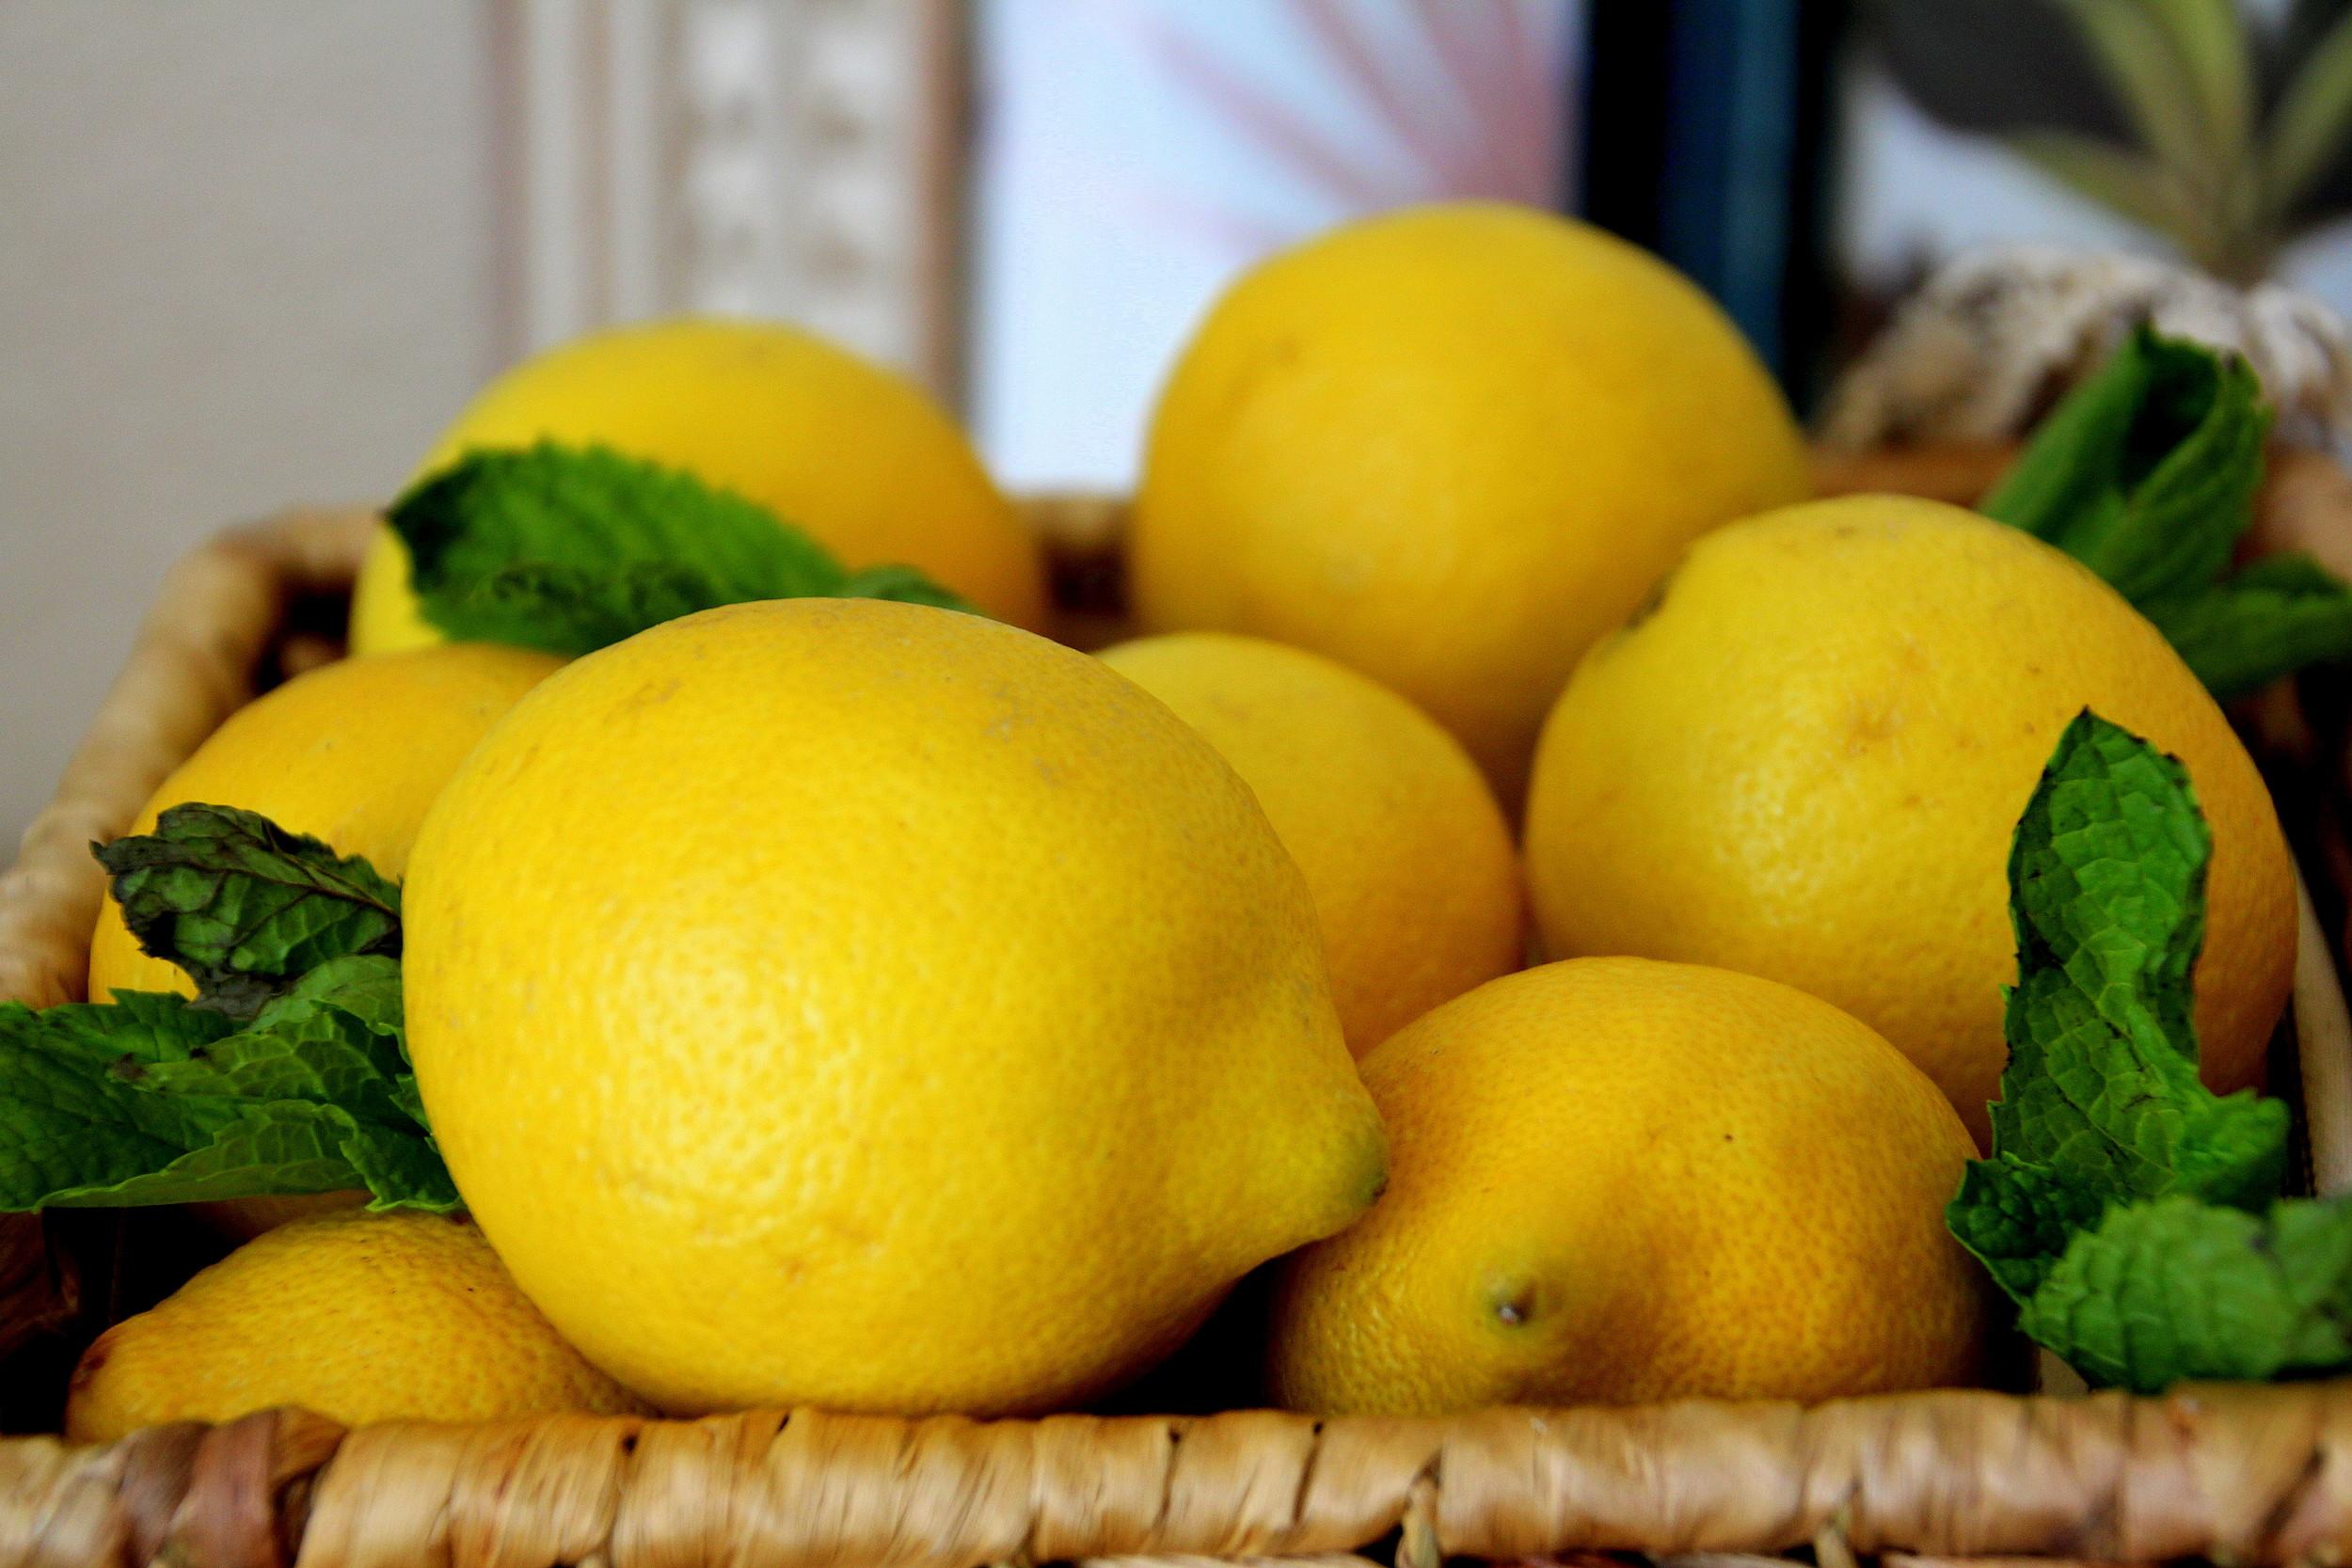 http://click.linksynergy.com/link?id=xFlkuCdZH4w&offerid=265118.74429&type=2&murl=http%3A%2F%2Fwww.puritan.com%2Fnow-foods-brand-0089%2Forganic-lemon-essential-oil-074429%3Fscid%3D4150%26cmp%3Dls-_-datafeed-_-Vegan-_-organic-lemon-essential-oil-_-074429